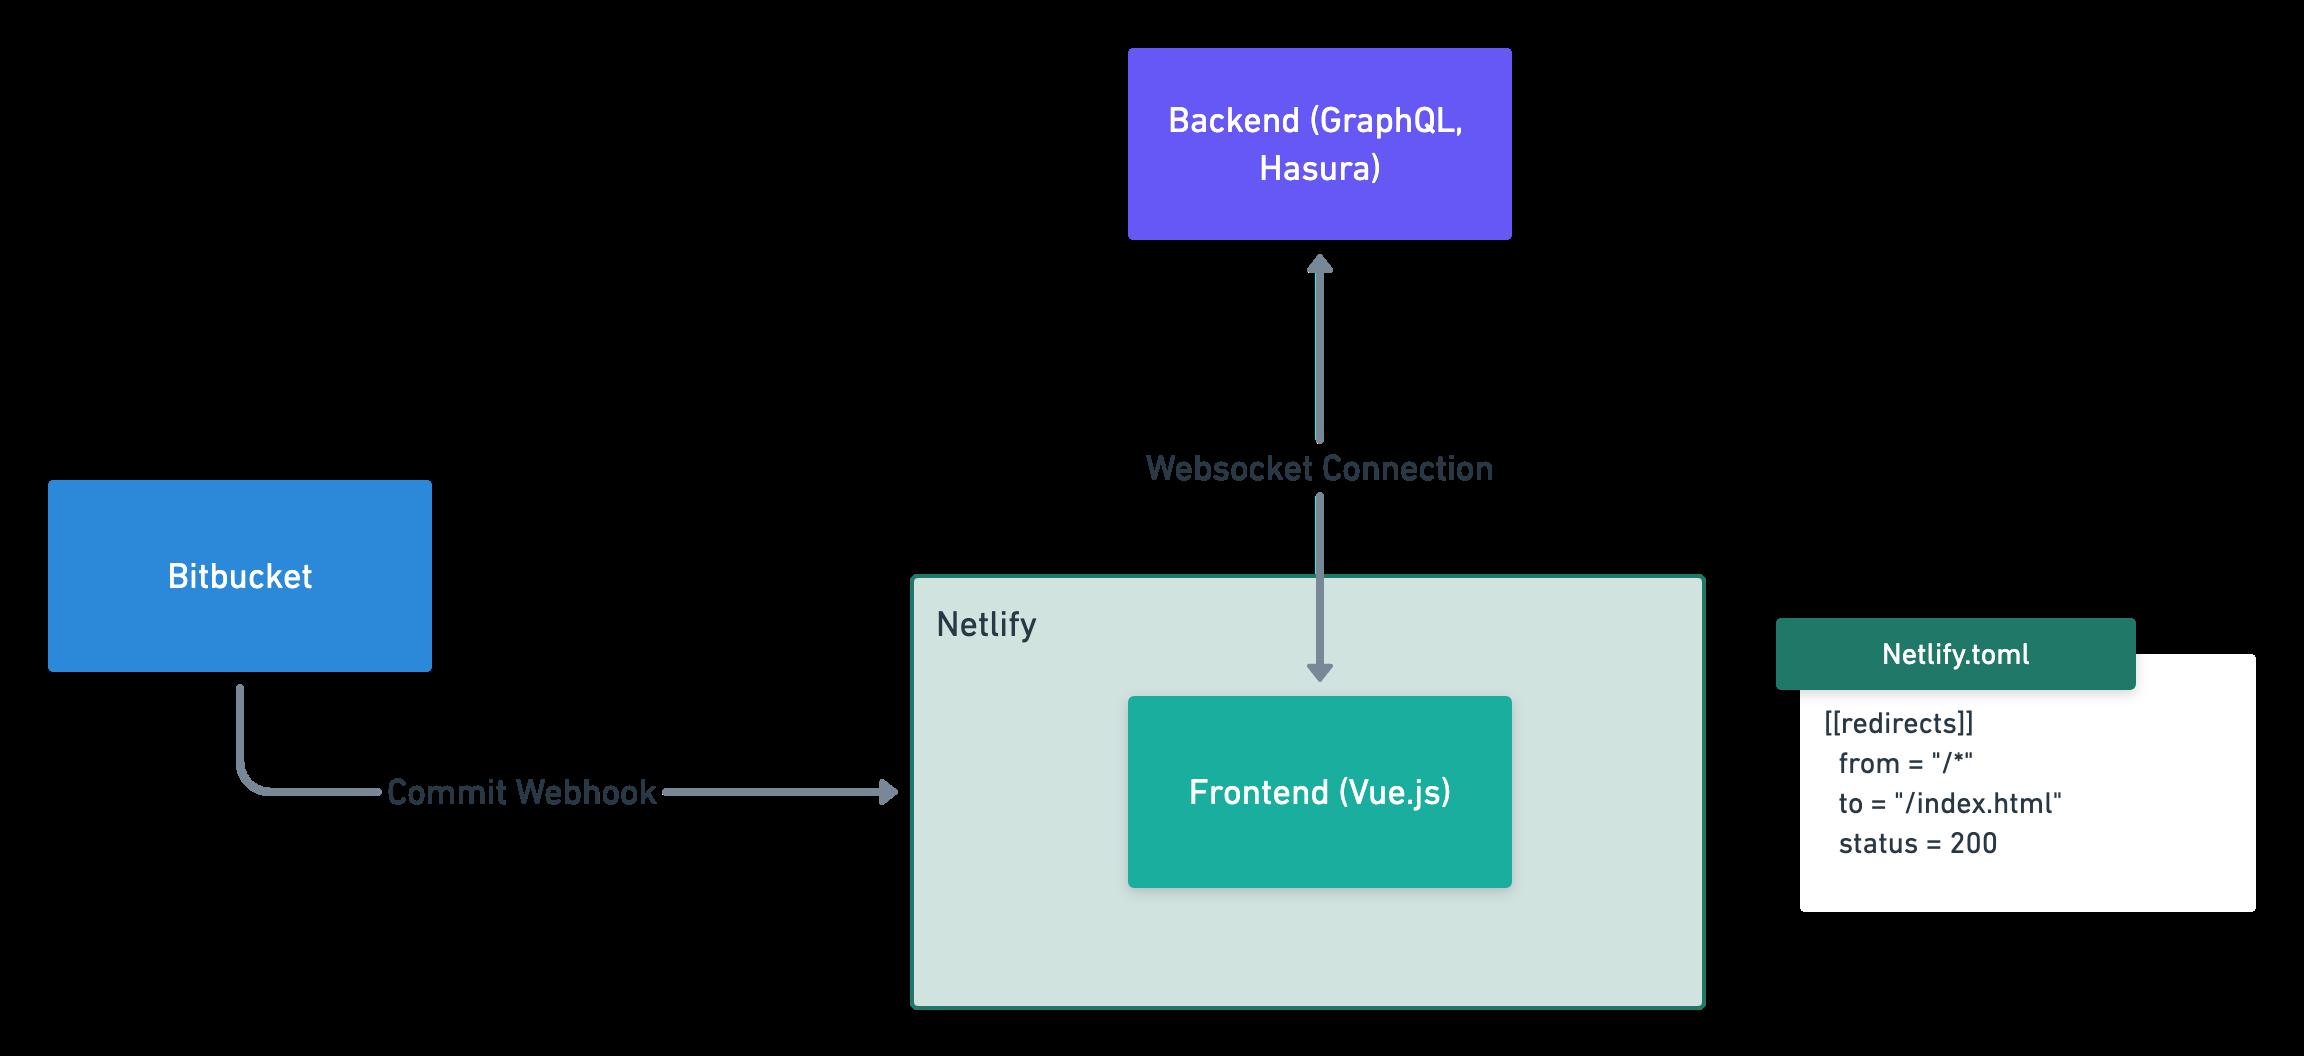 Fieldfusion architecture with Bitbucket, GraphQL, Hasura, Vue and Netlify